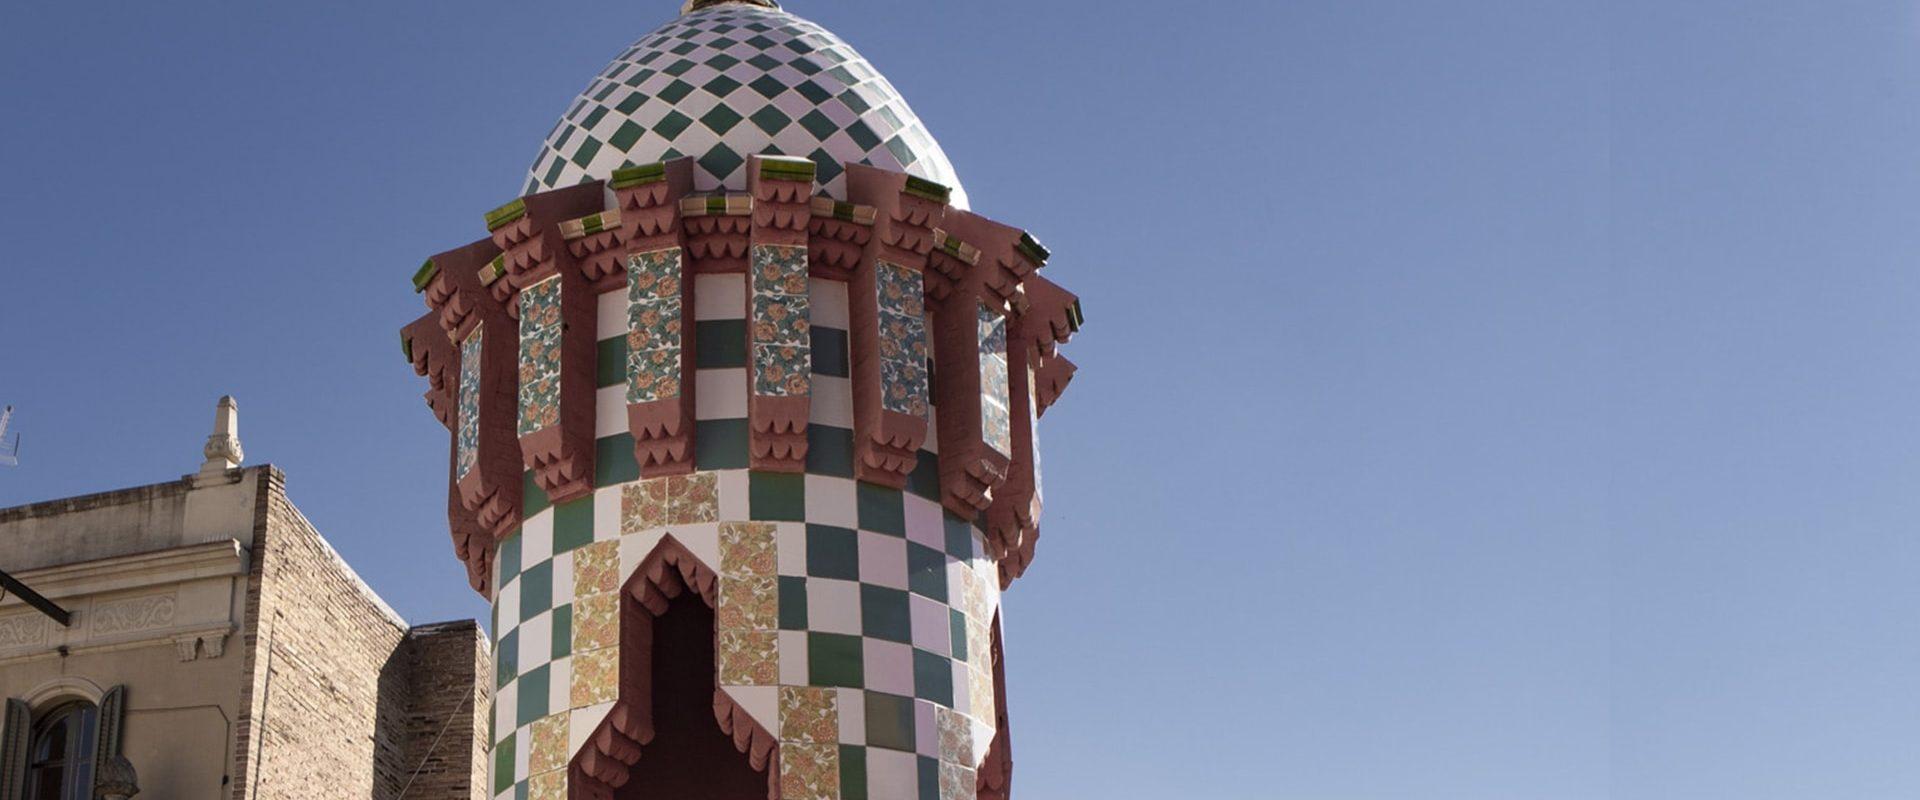 Visiter La Casa Vicens à Barcelone